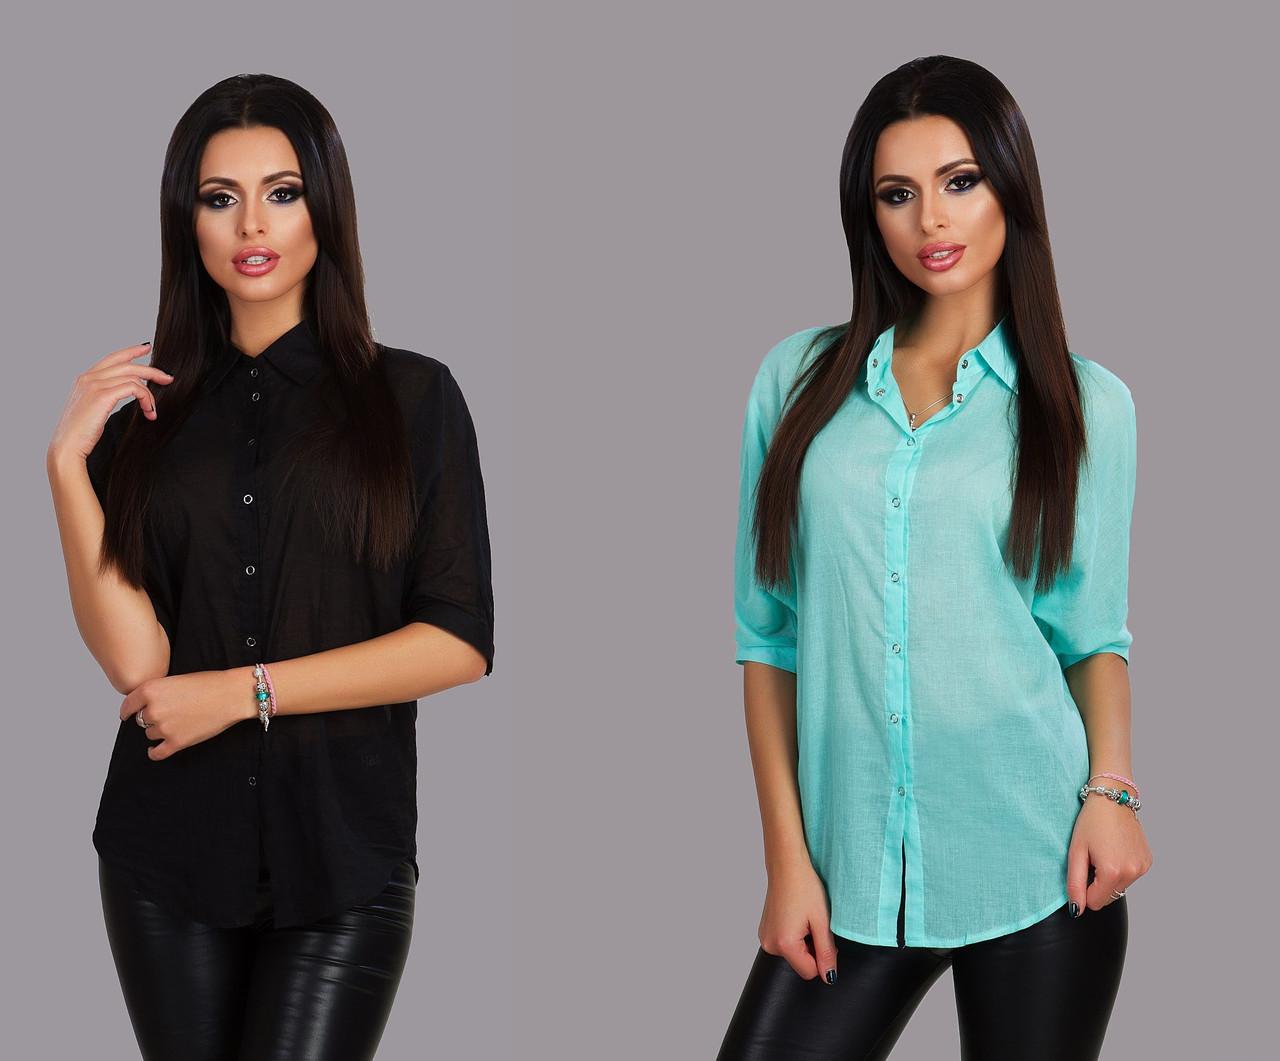 Женская блузка турецкий лен -